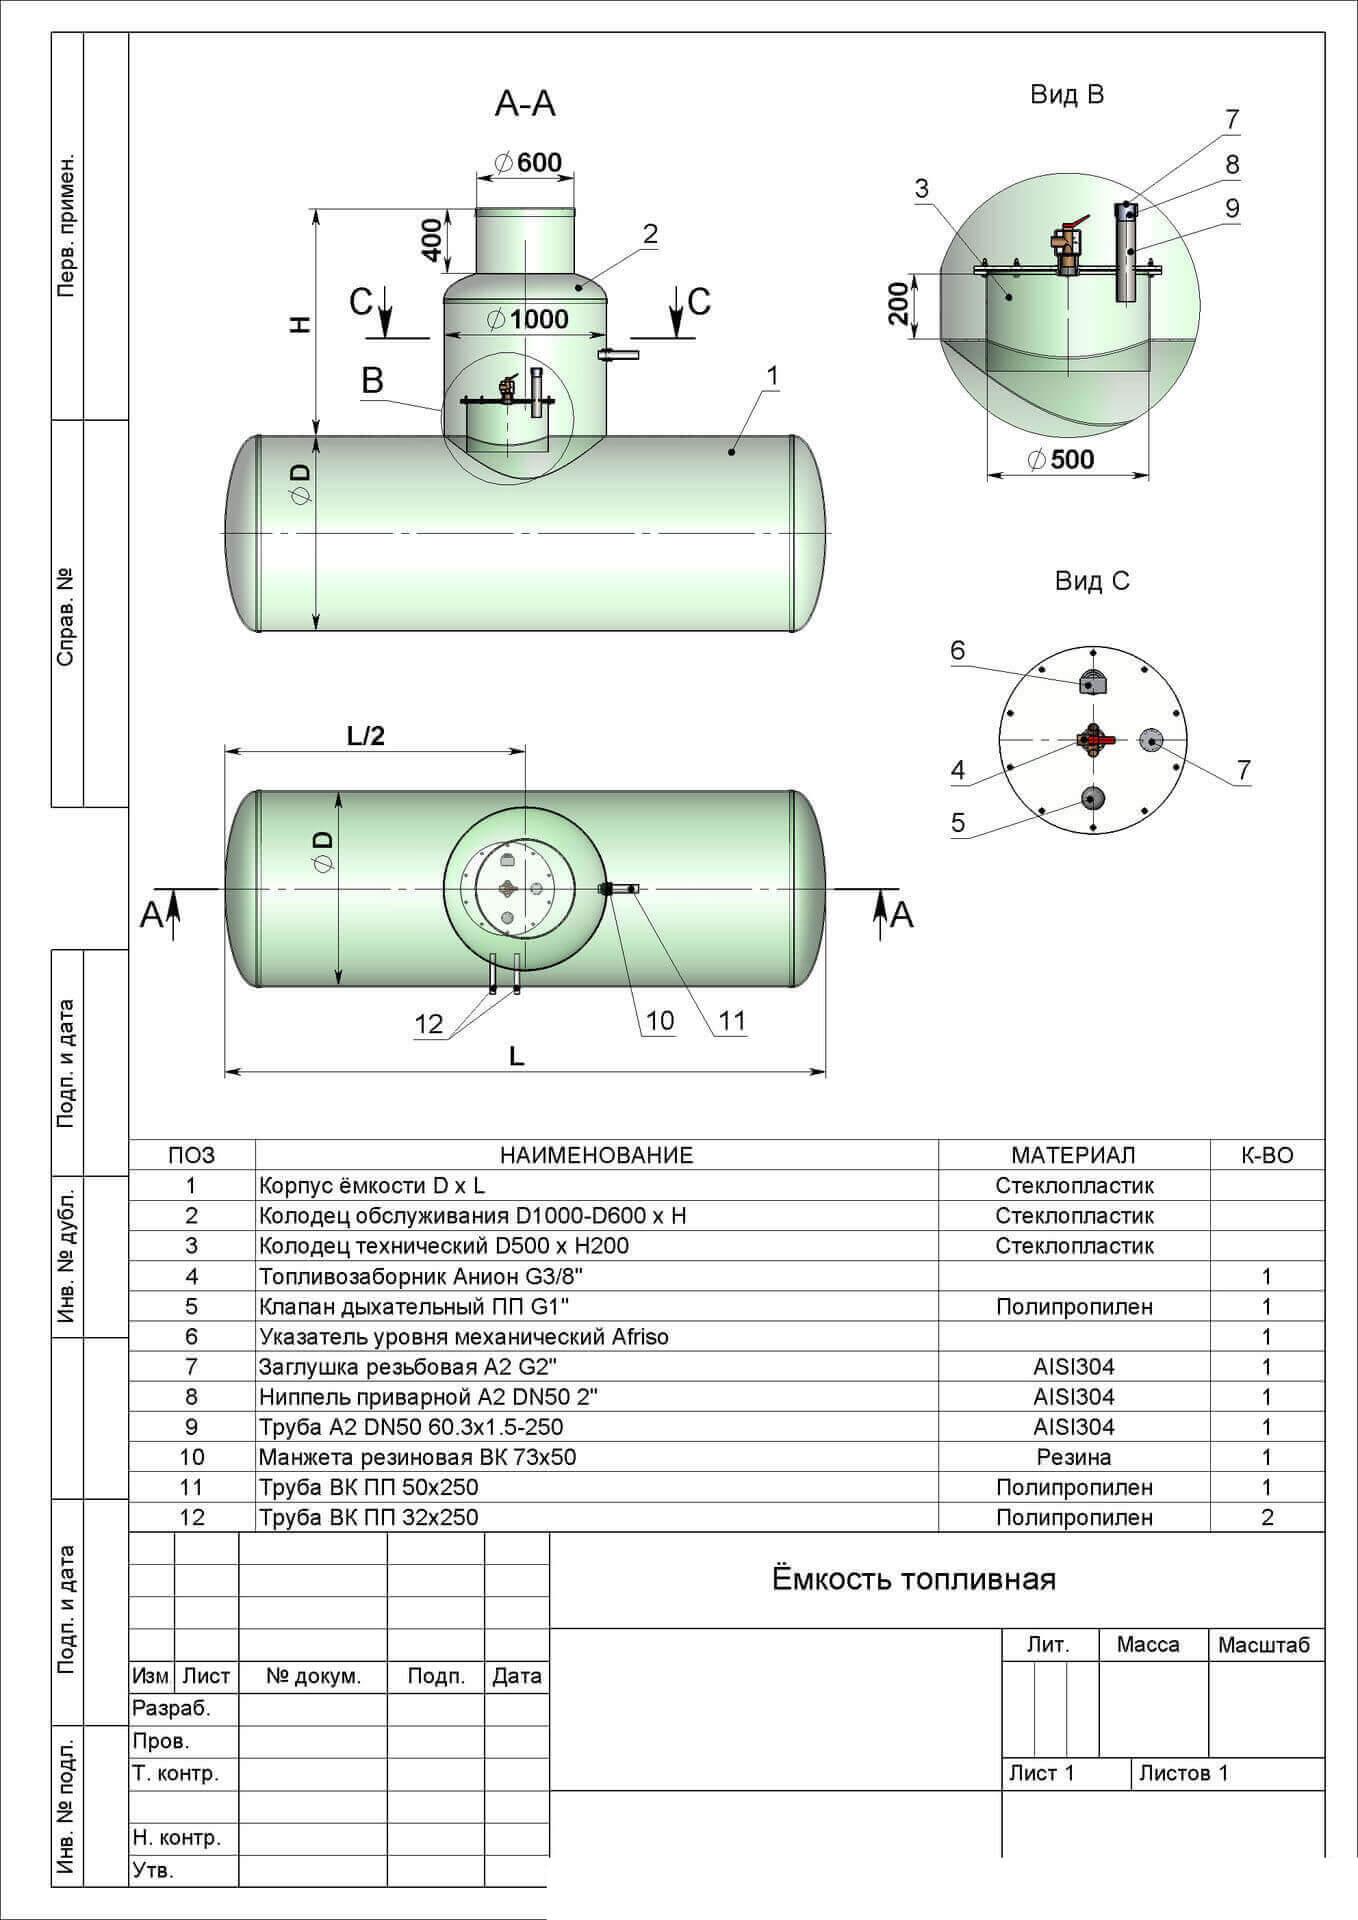 toplivnye emkosti5 Топливные емкости и резервуары